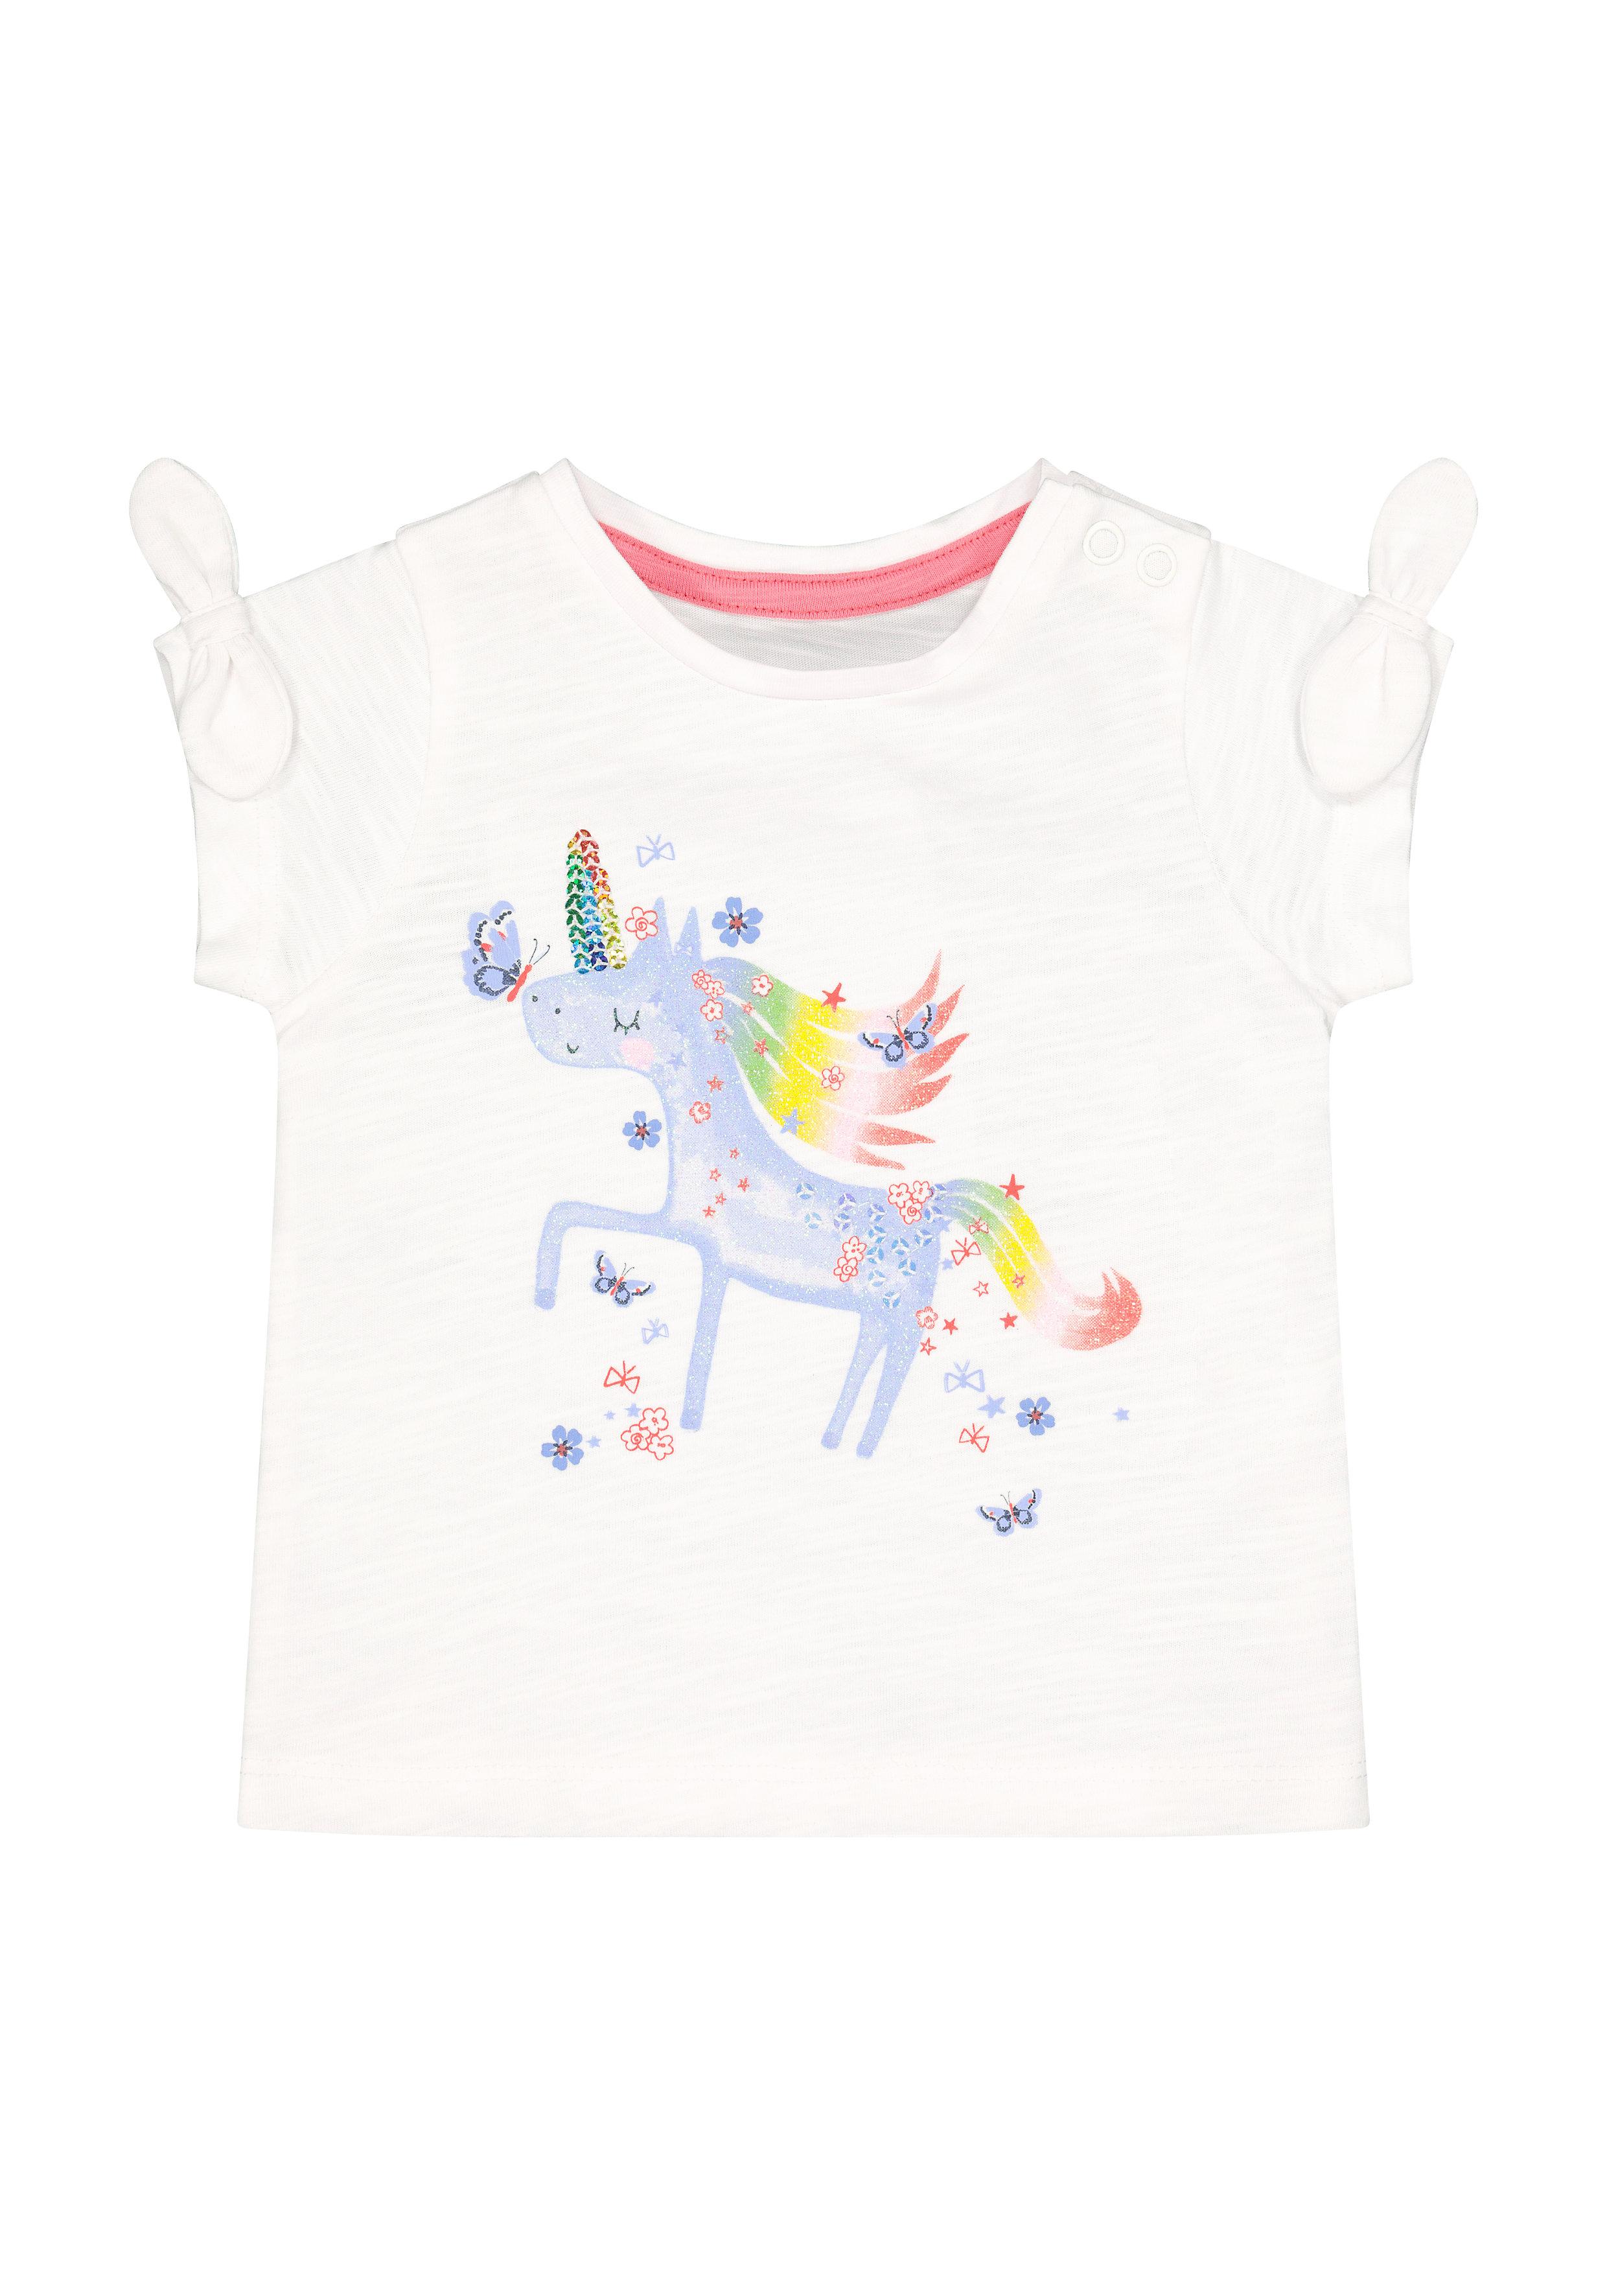 Mothercare | Girls Half Sleeves Round Neck T-shirts  - White